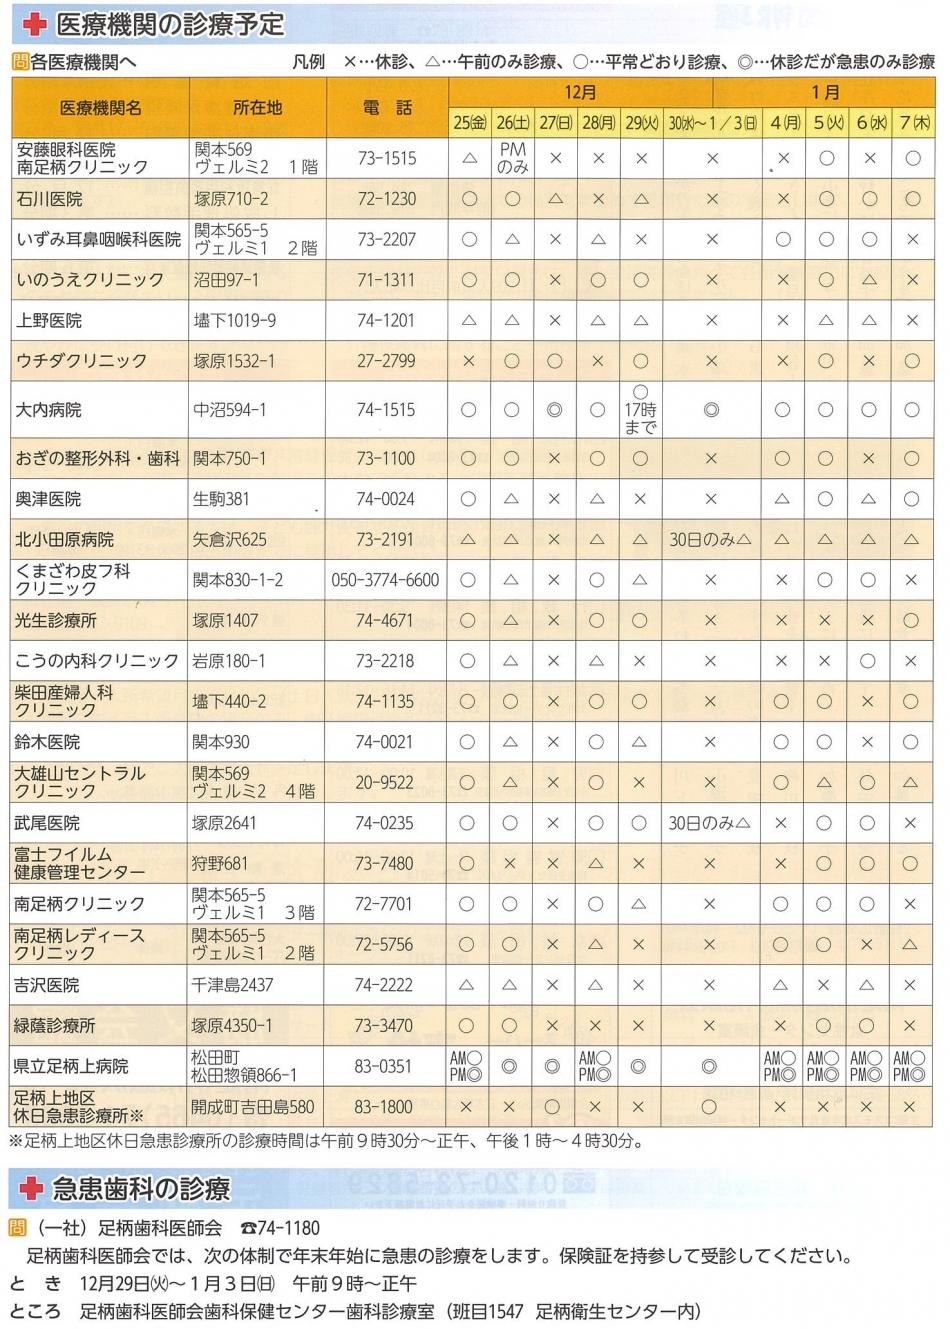 令和2年の年末年始医療機関診療一覧表